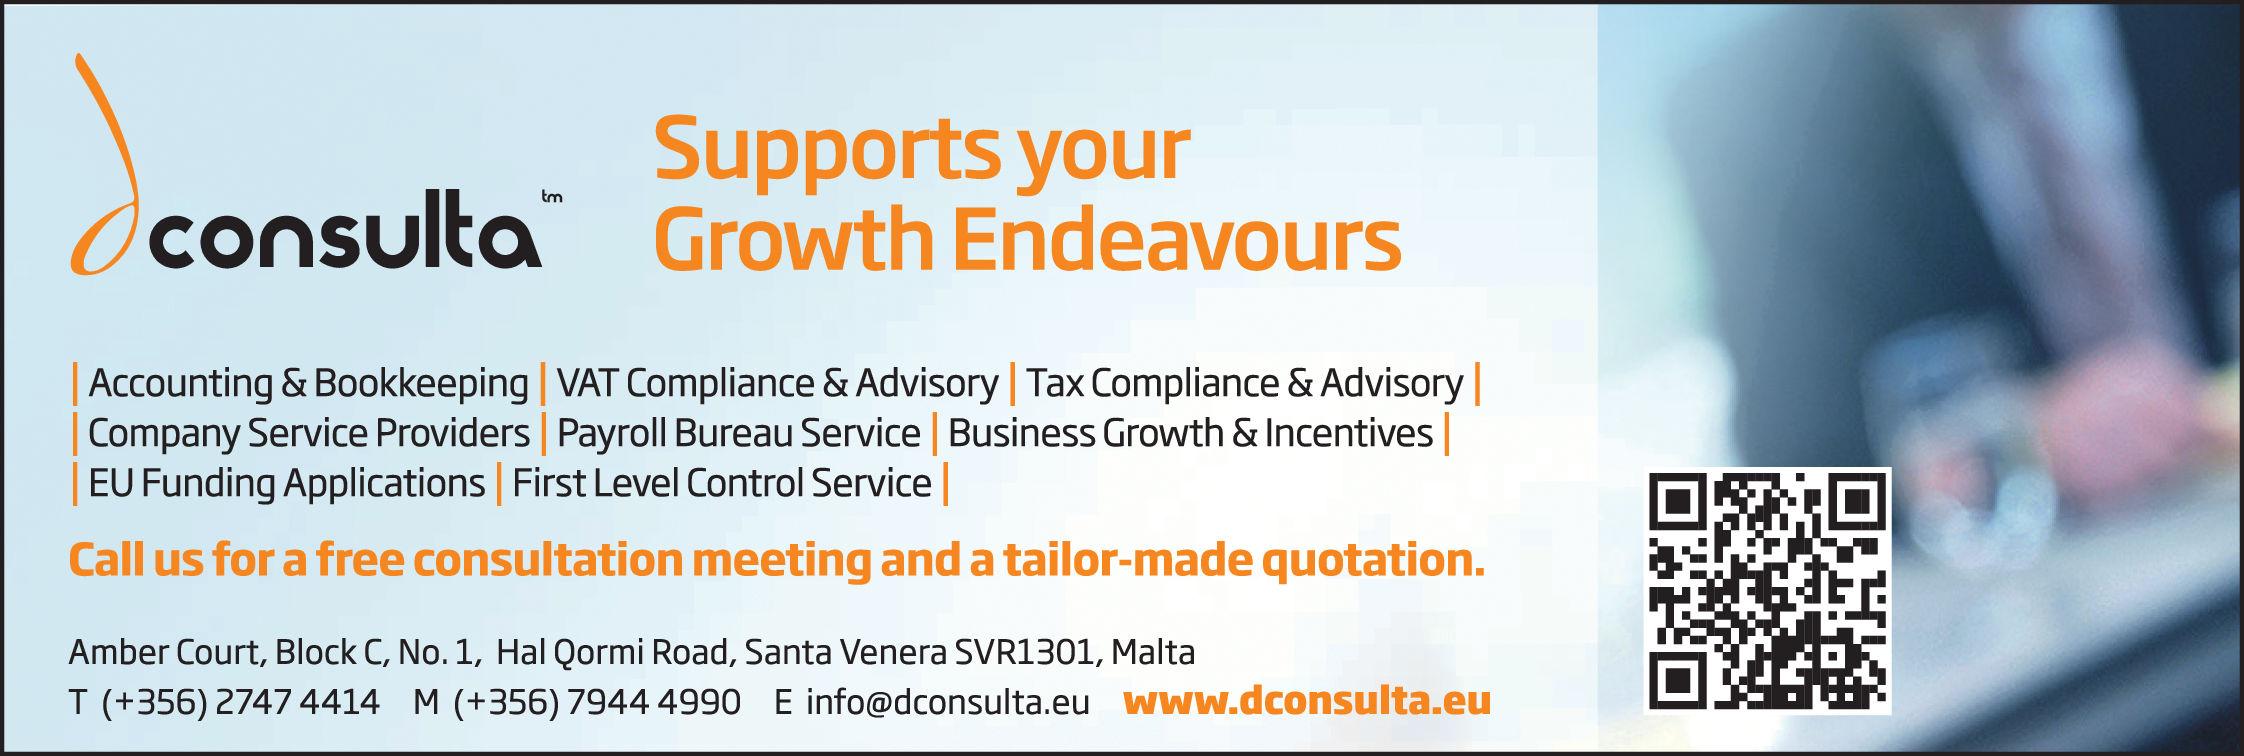 DConsulta Ltd - Accountants-Certified Public in Sta Venera